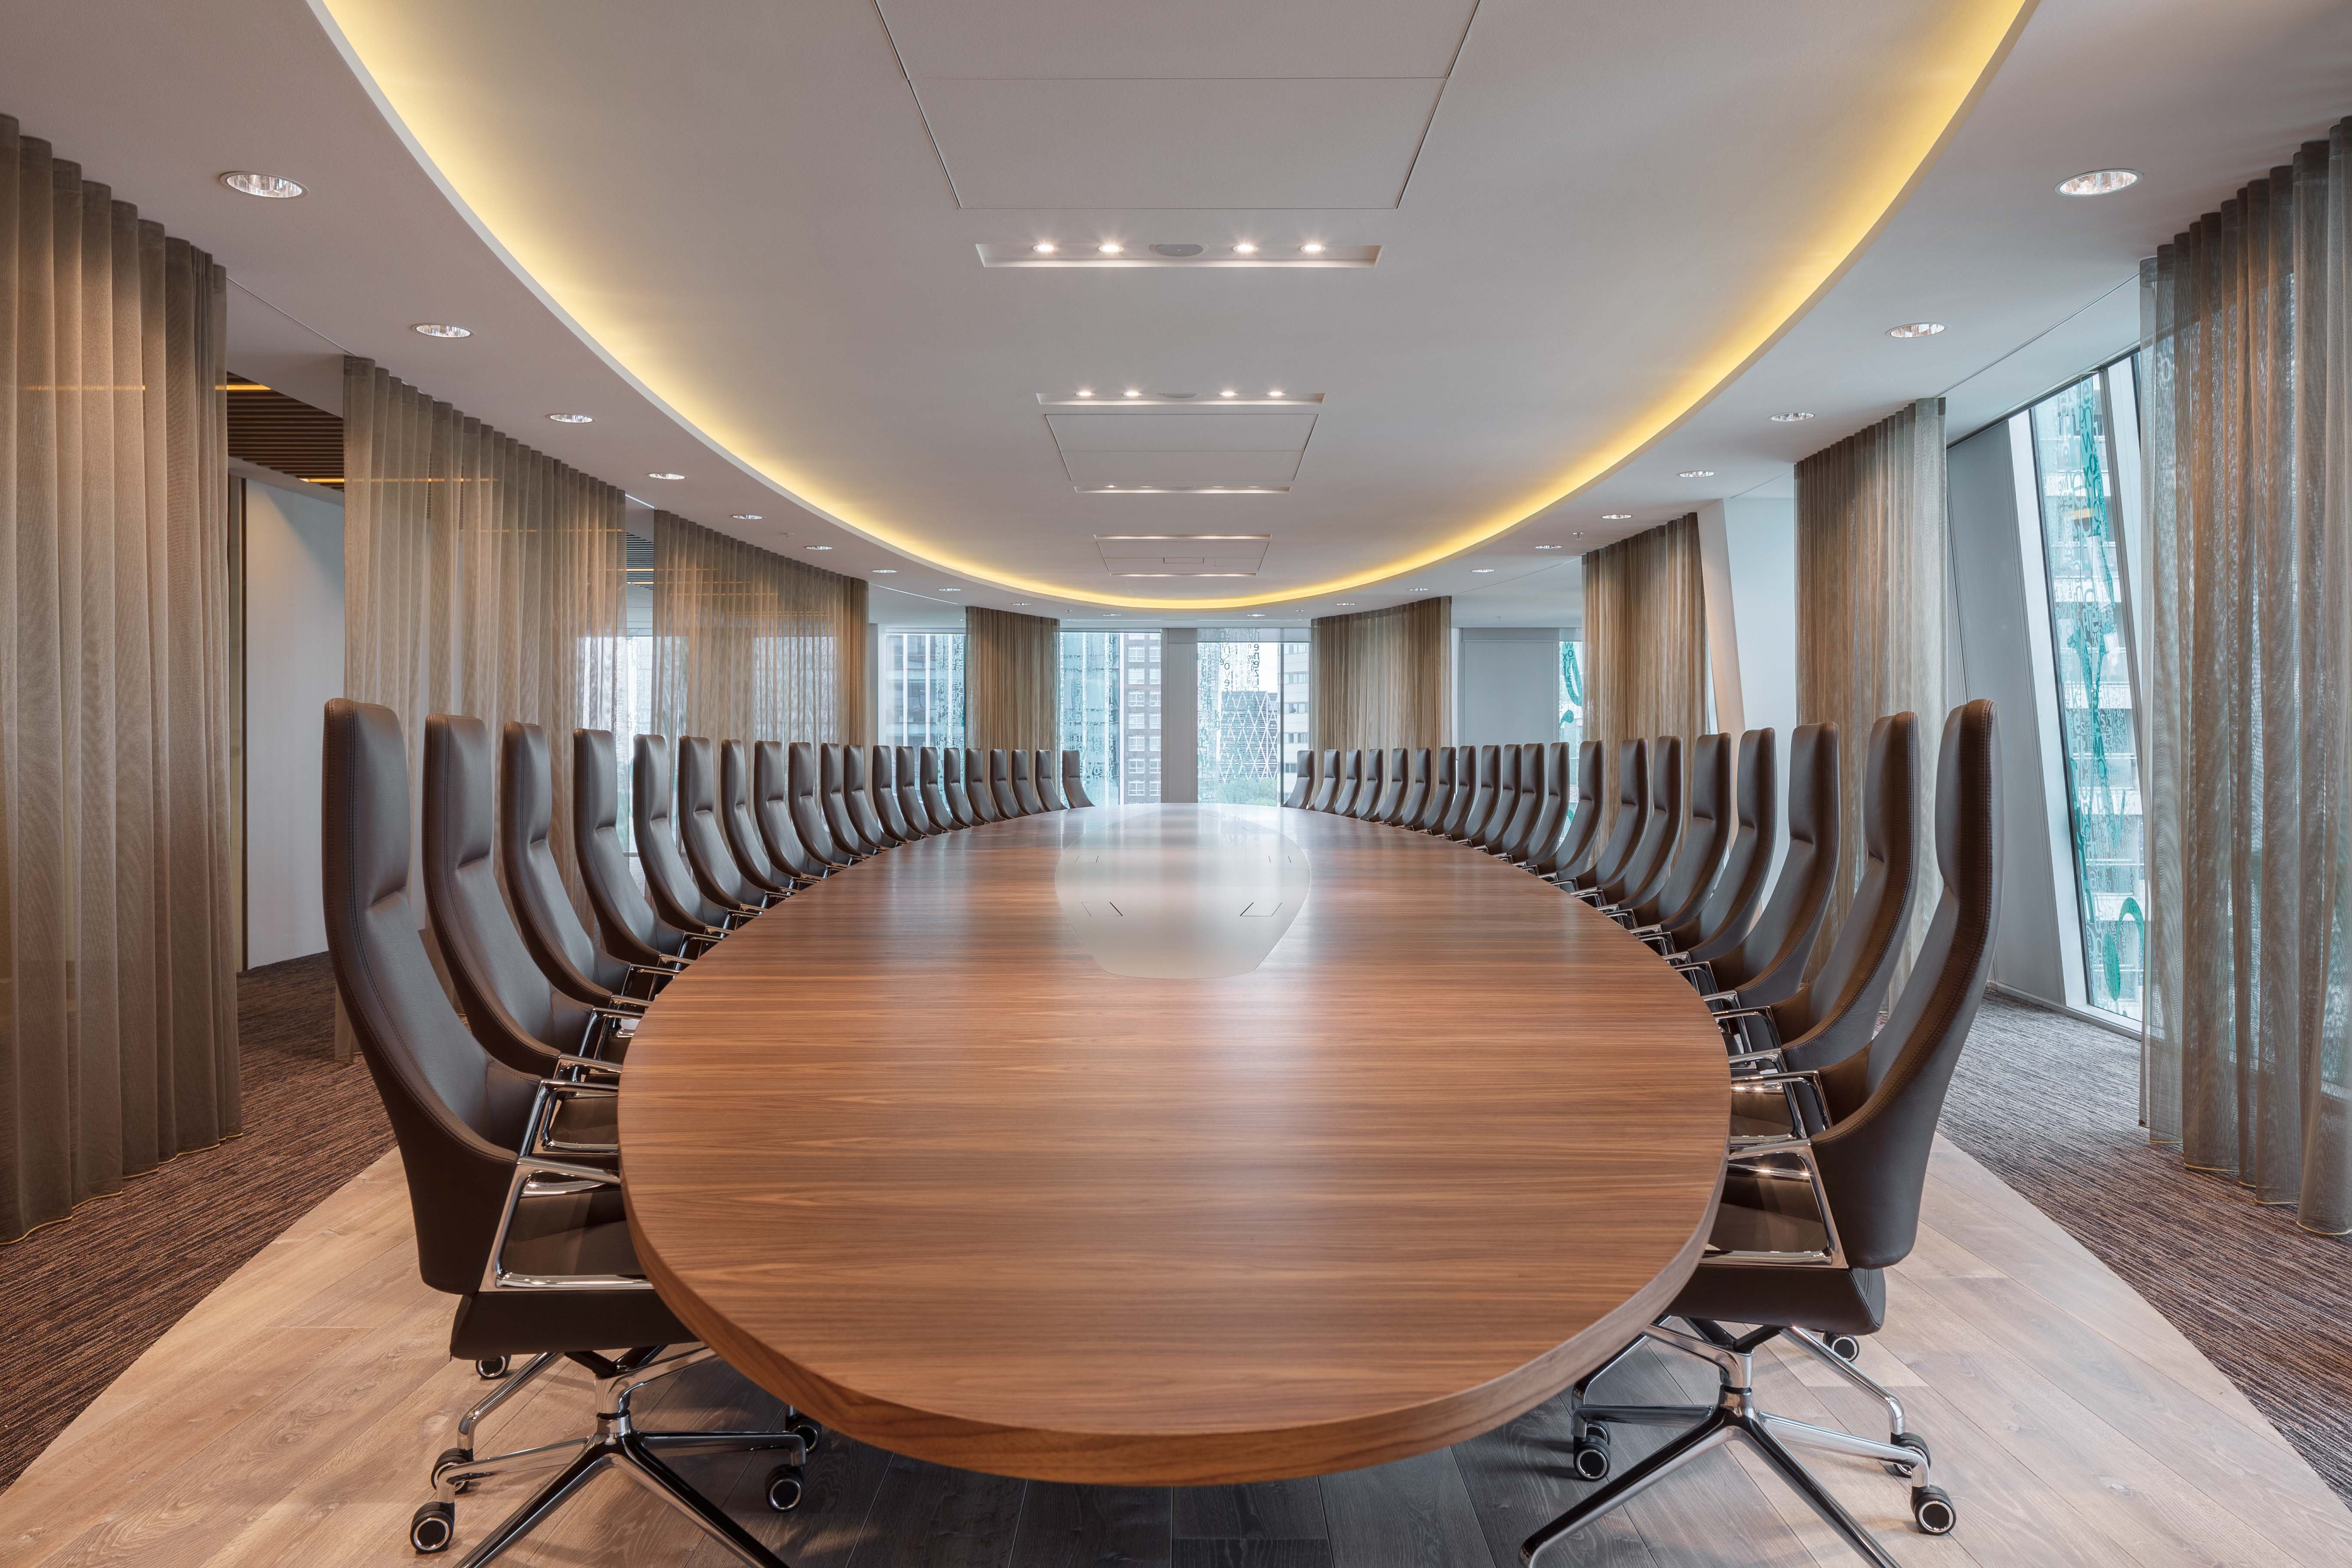 impromptu oval office meeting - HD5425×3617